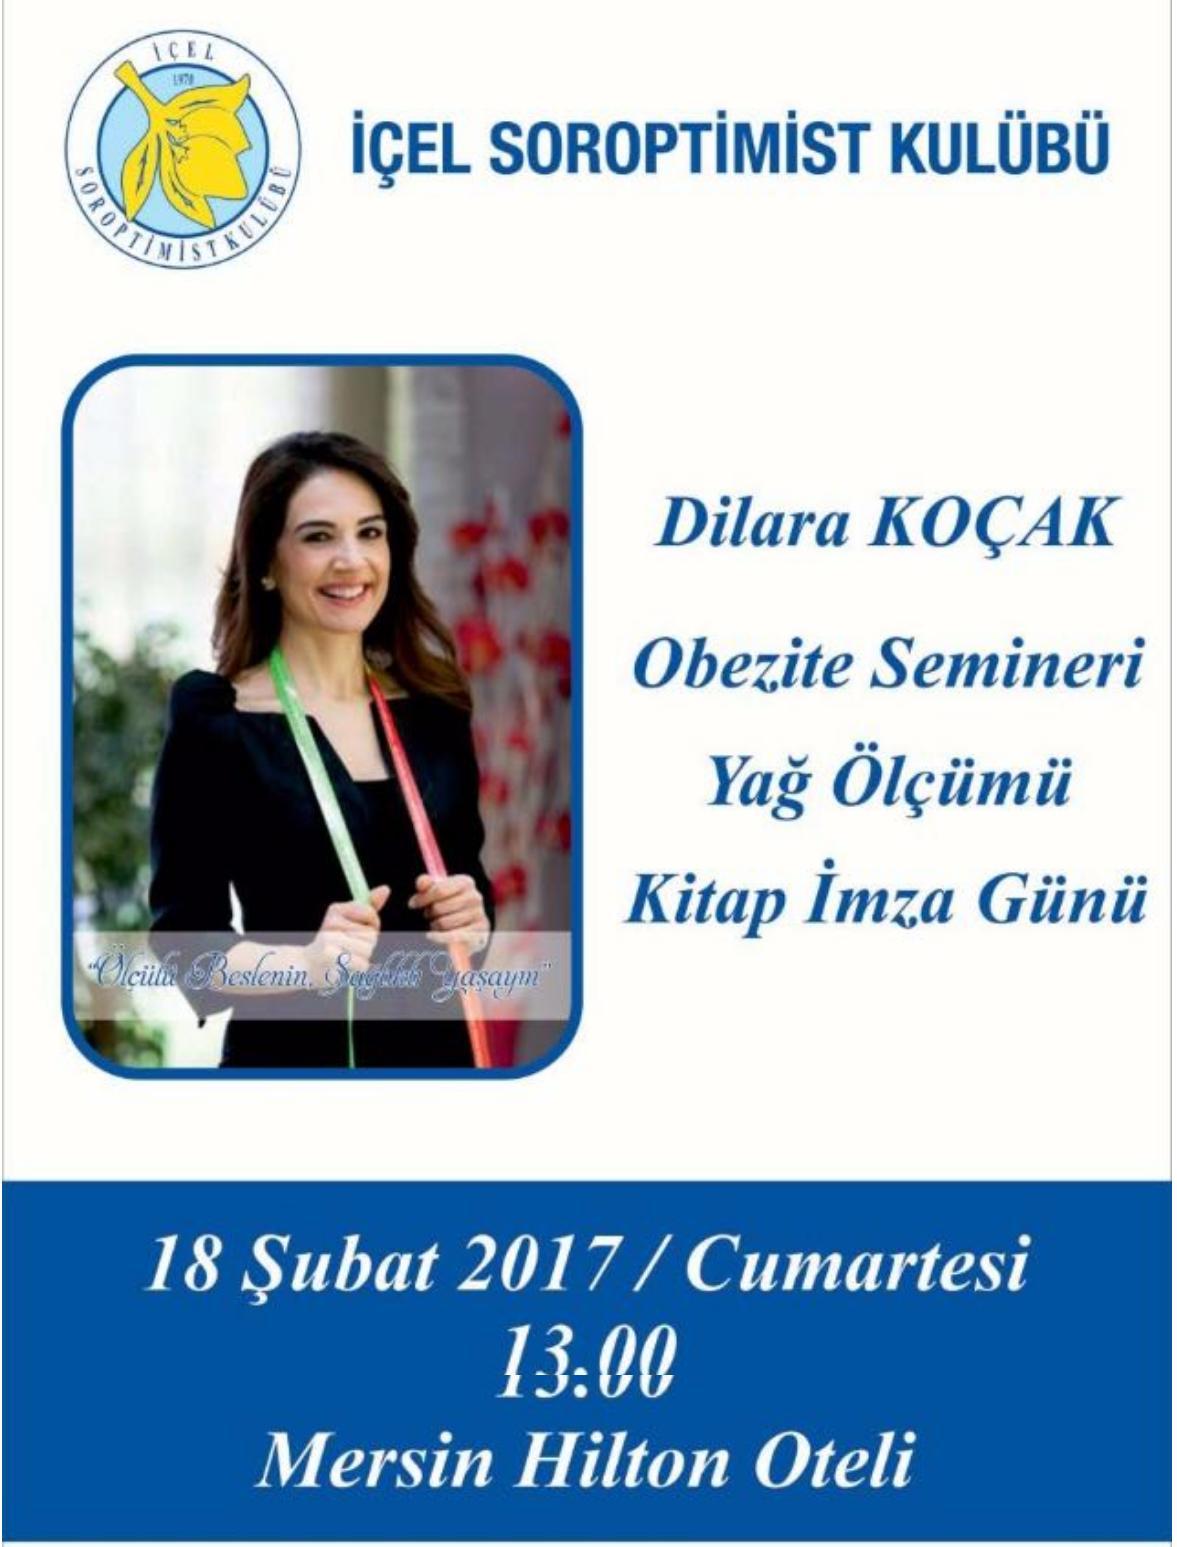 Seminar on Obesity by Dilara Kocak